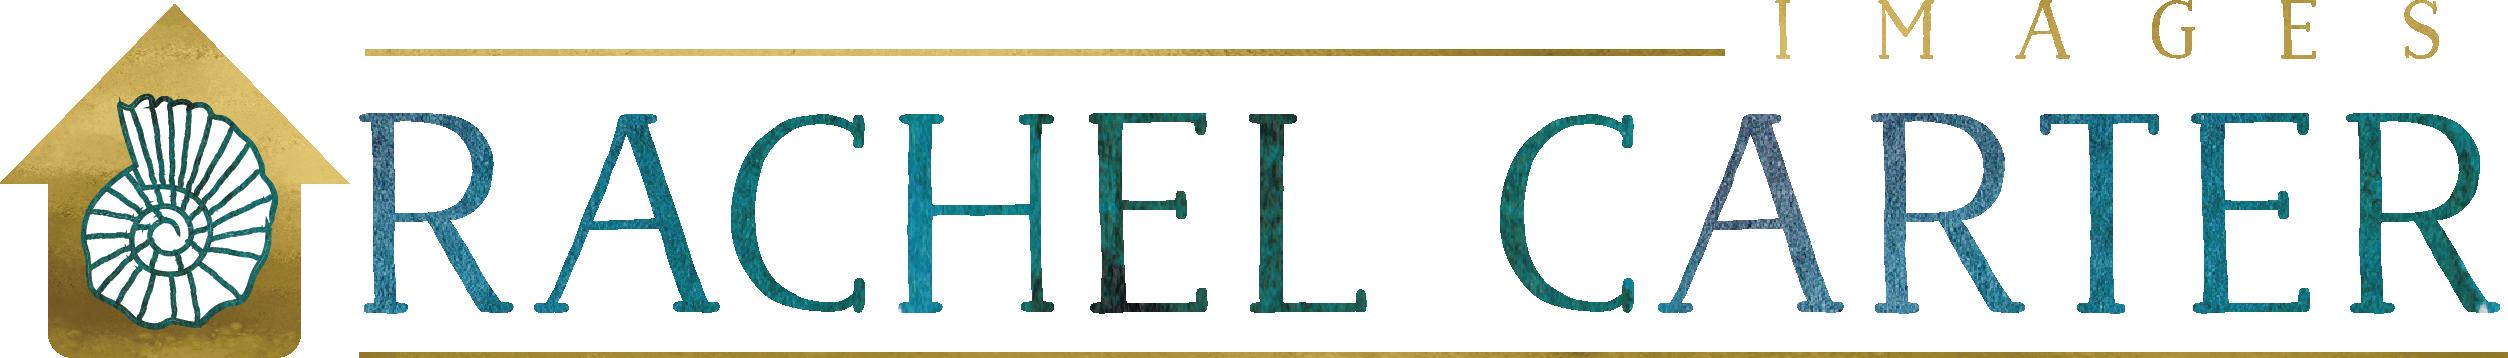 Rachel Carter Images Logo